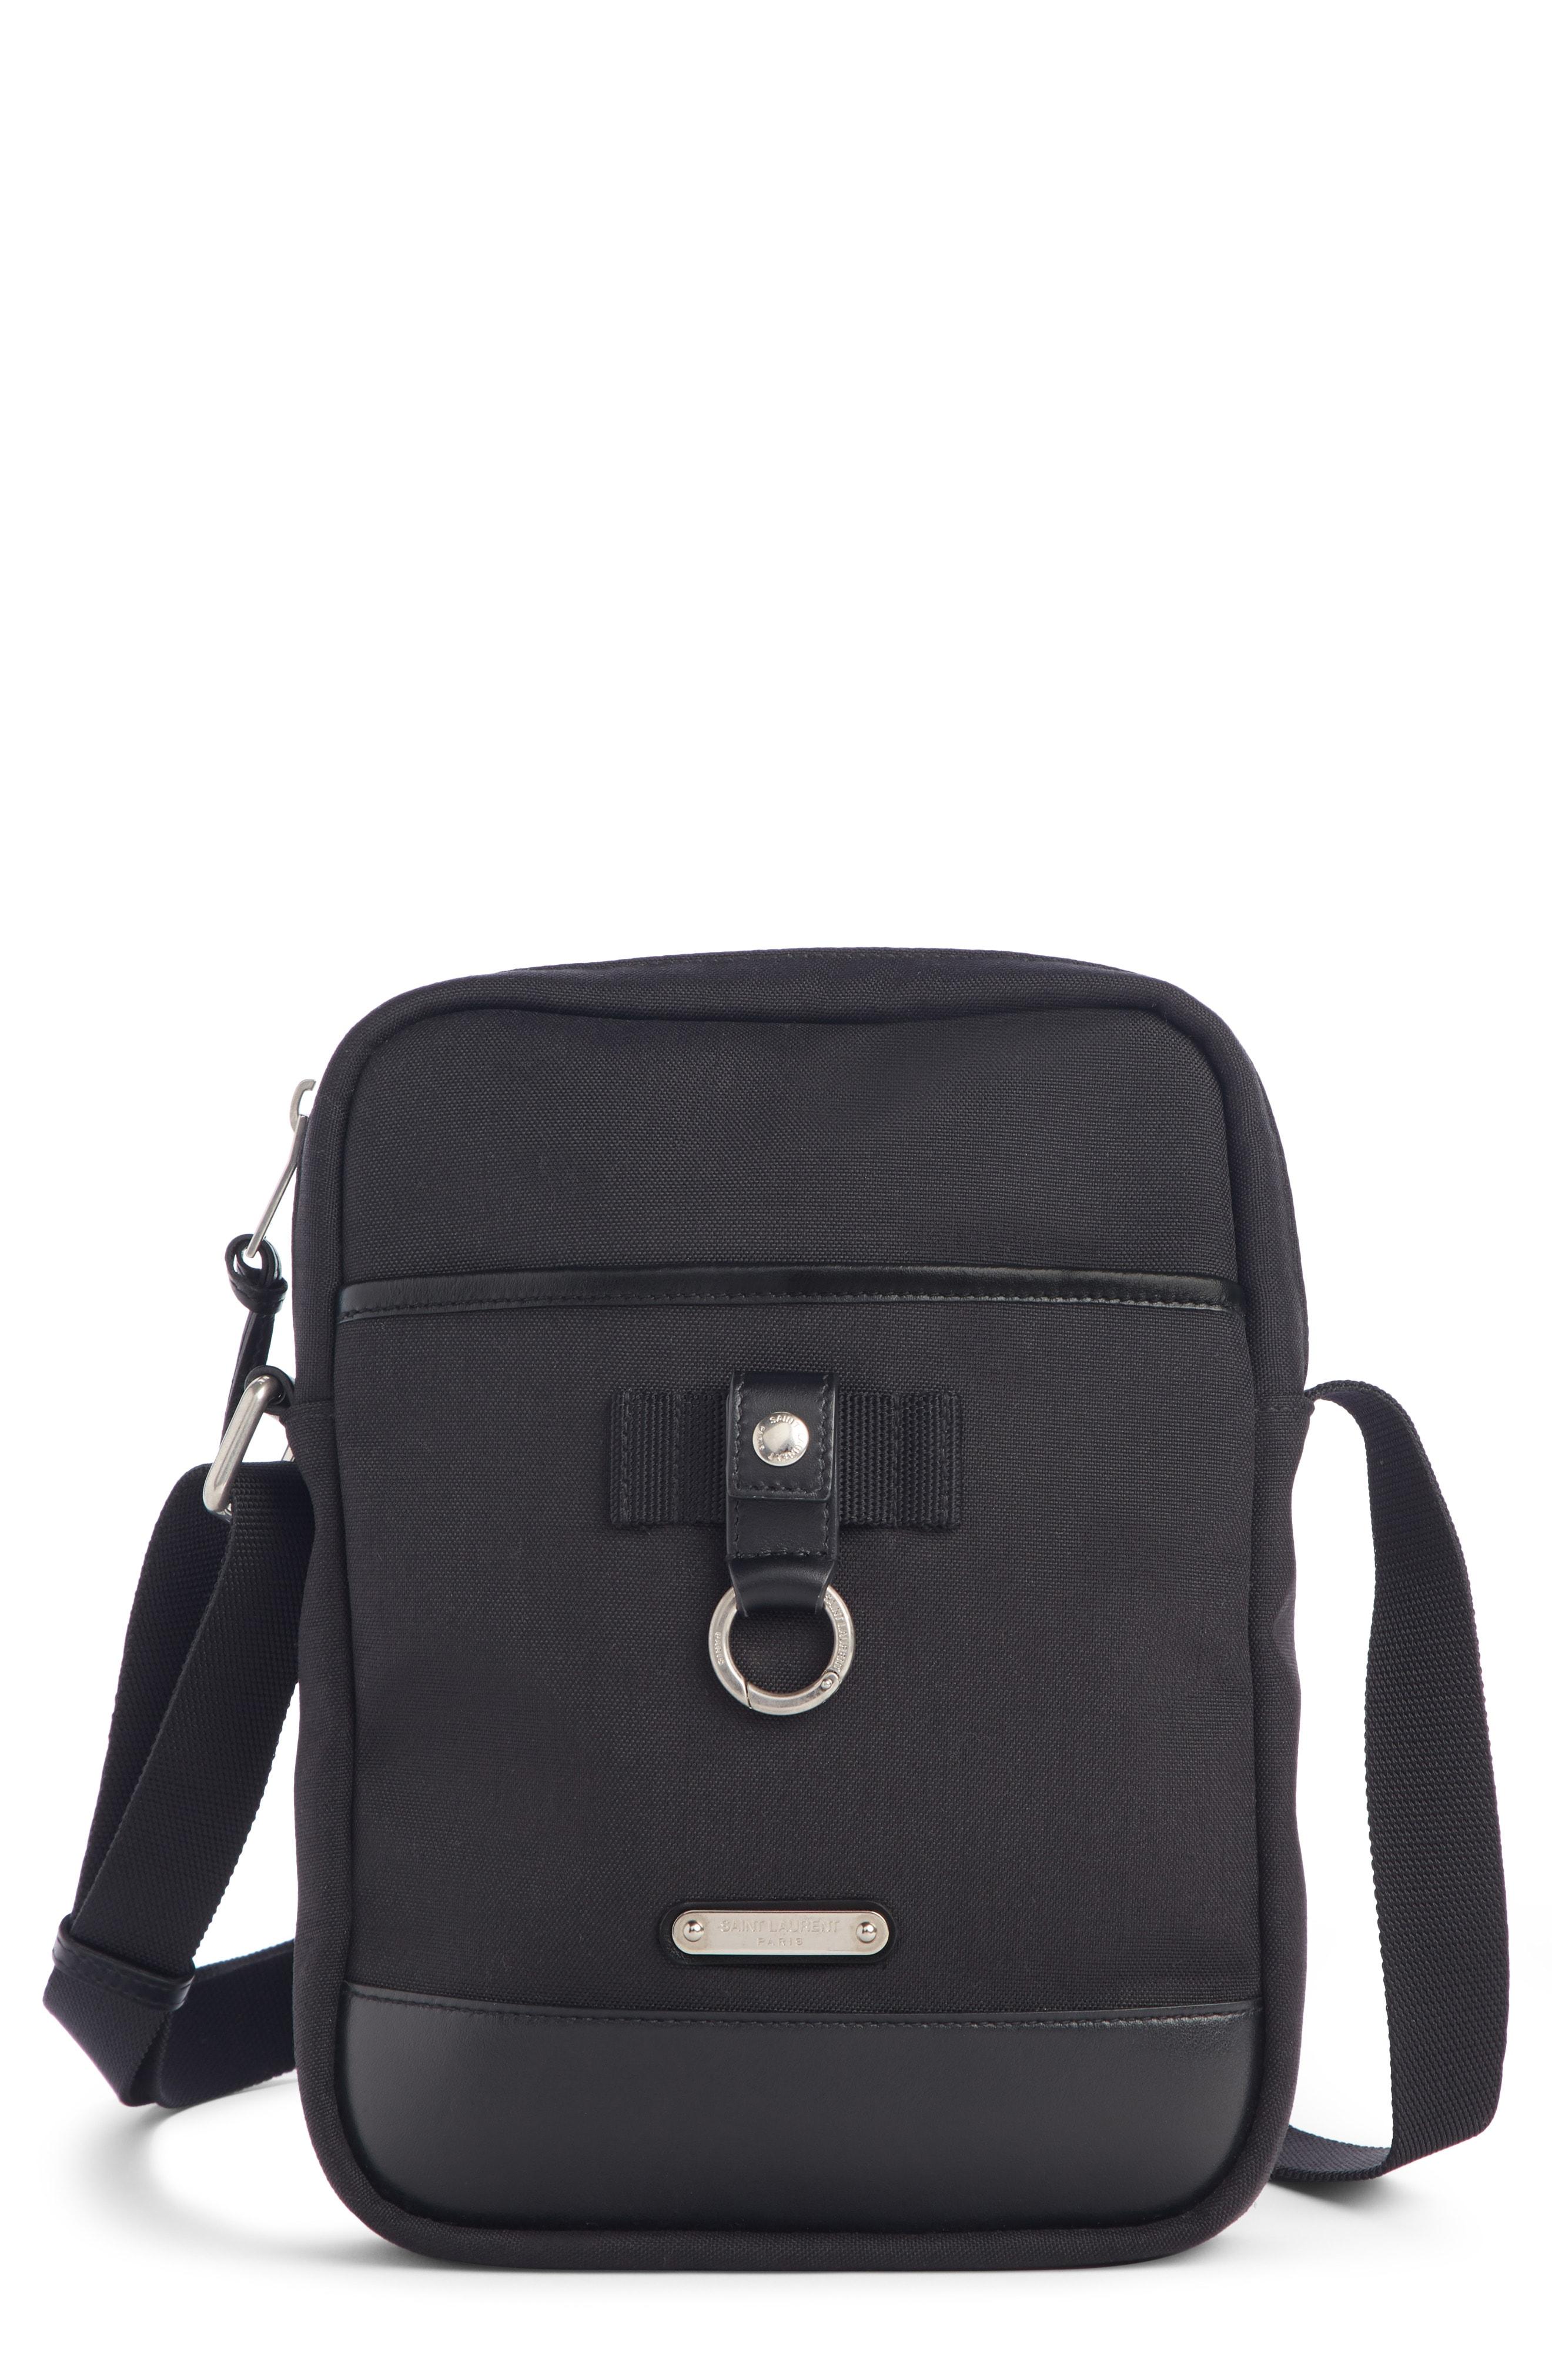 eb7ca798ab2 Men's Saint Laurent Small Messenger Bag – Black | The Fashionisto